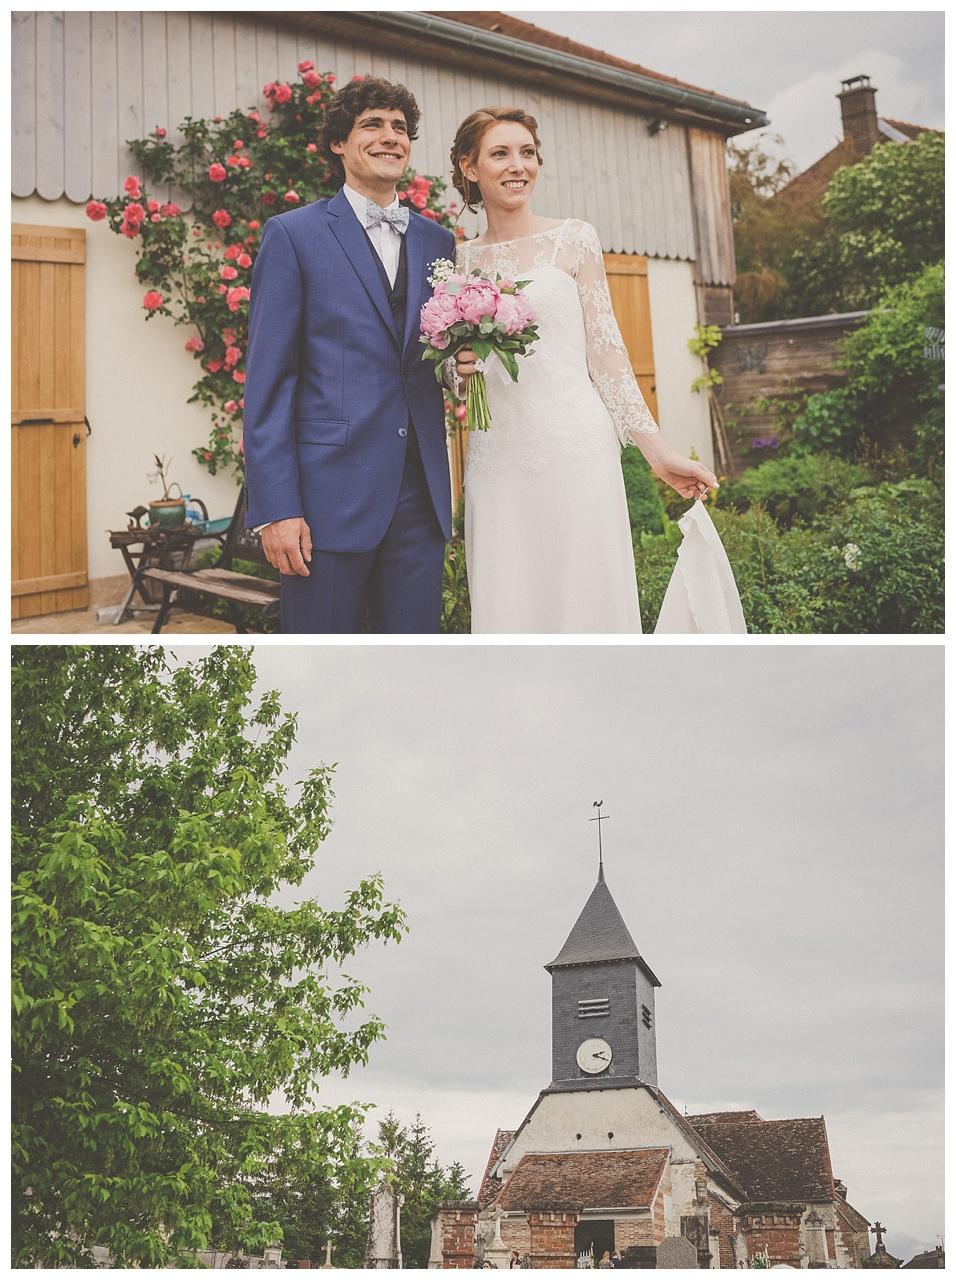 mariage-naturel-domaine-de-vermoise-troyes_0151